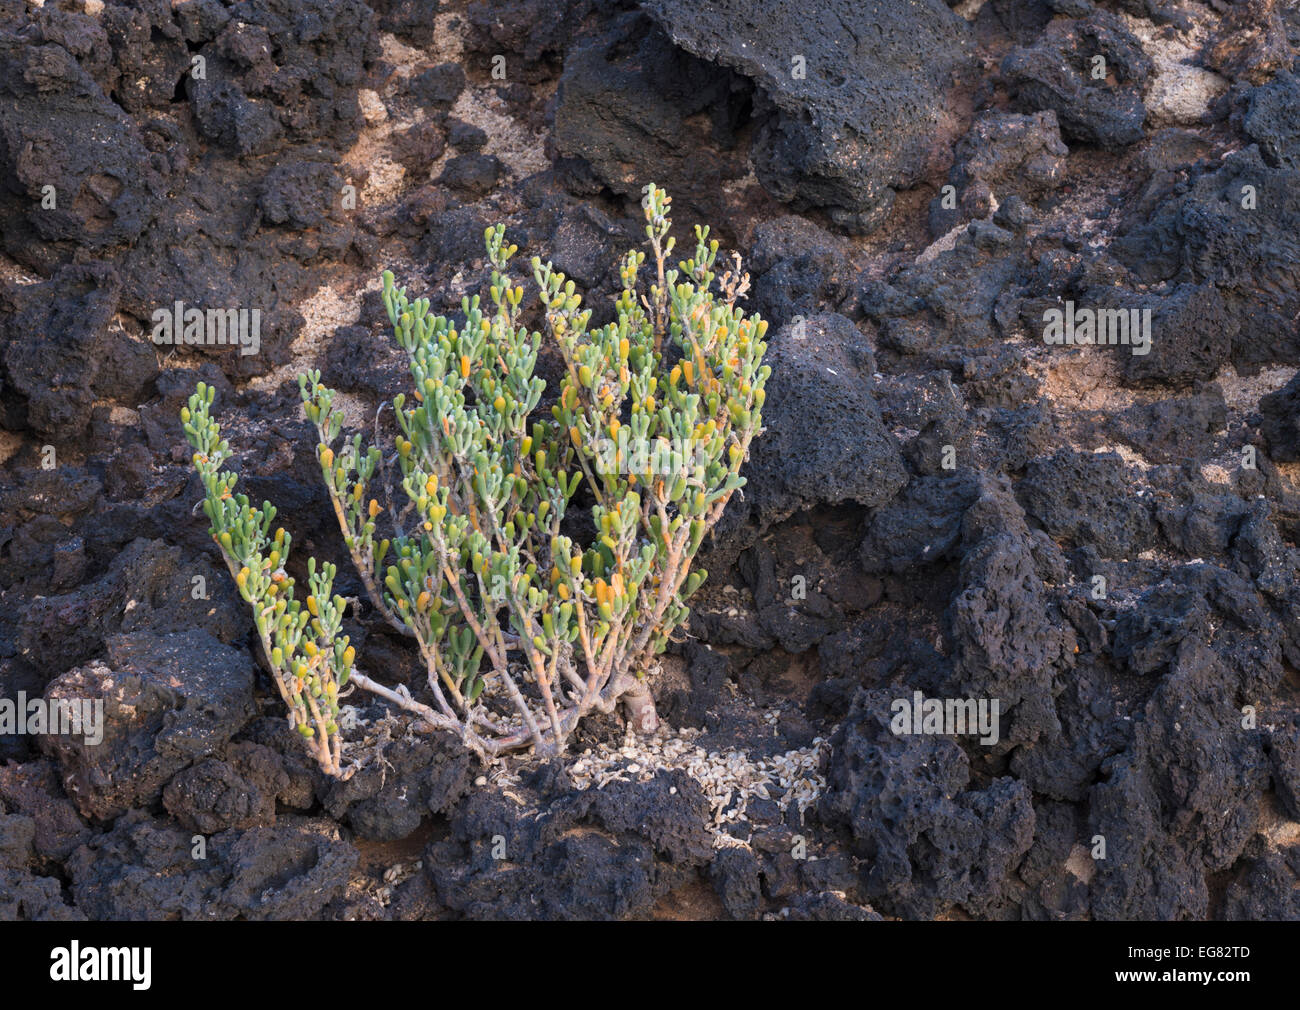 Zygophyllum fontanesii (uvilla de mar, sea grape), a very salt-tolerant plant which grows close to the sea in the Stock Photo